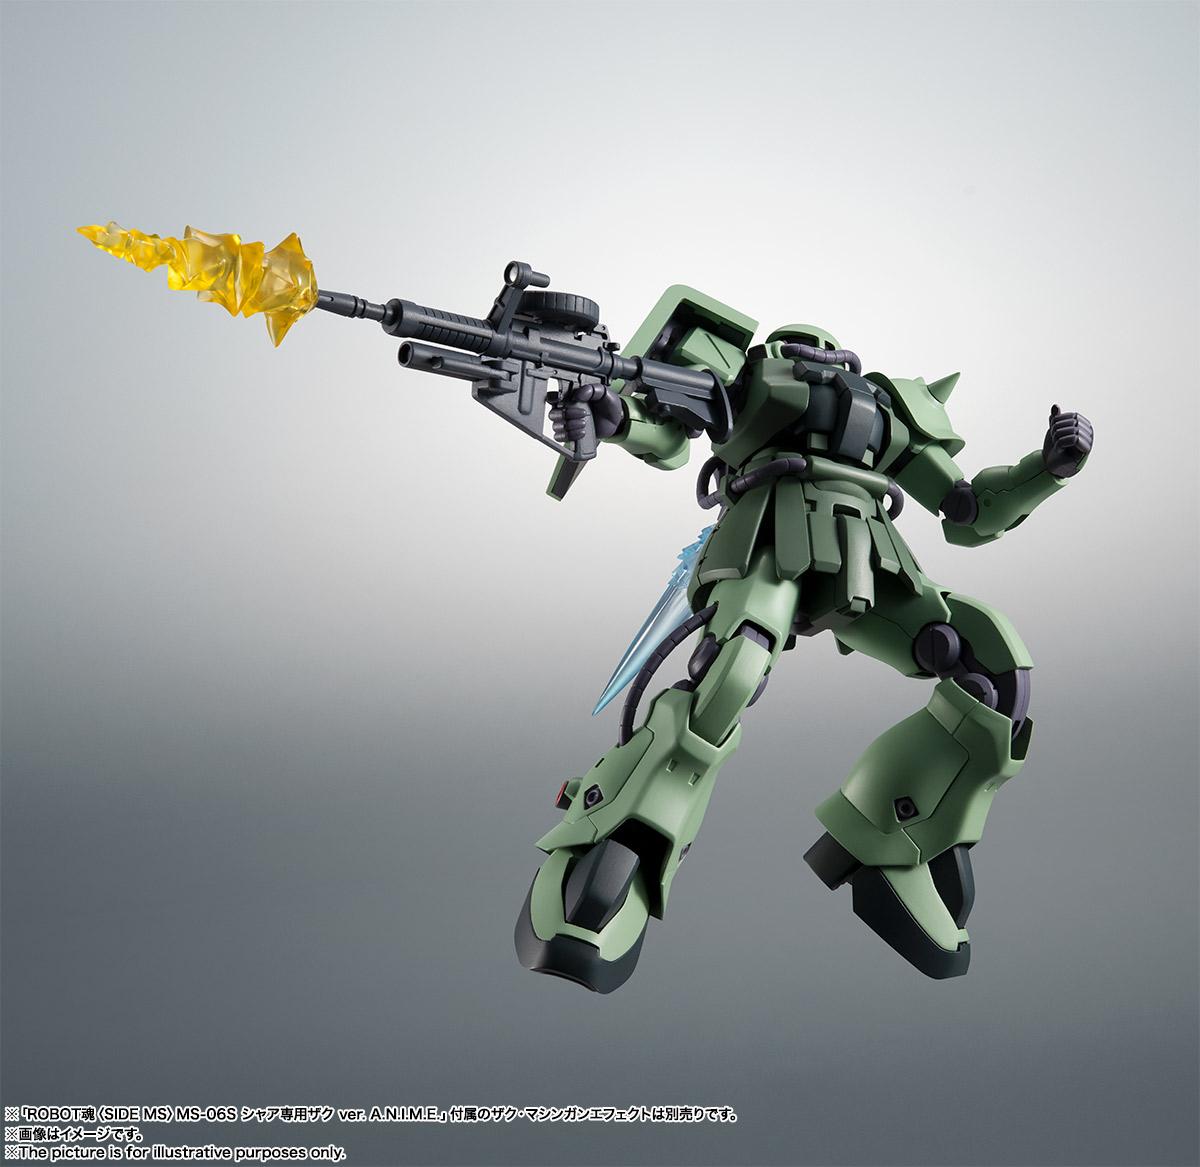 ROBOT魂〈SIDE MS〉『MS-06F-2 ザクII F2型 ver. A.N.I.M.E.』機動戦士ガンダム0083 可動フィギュア-009